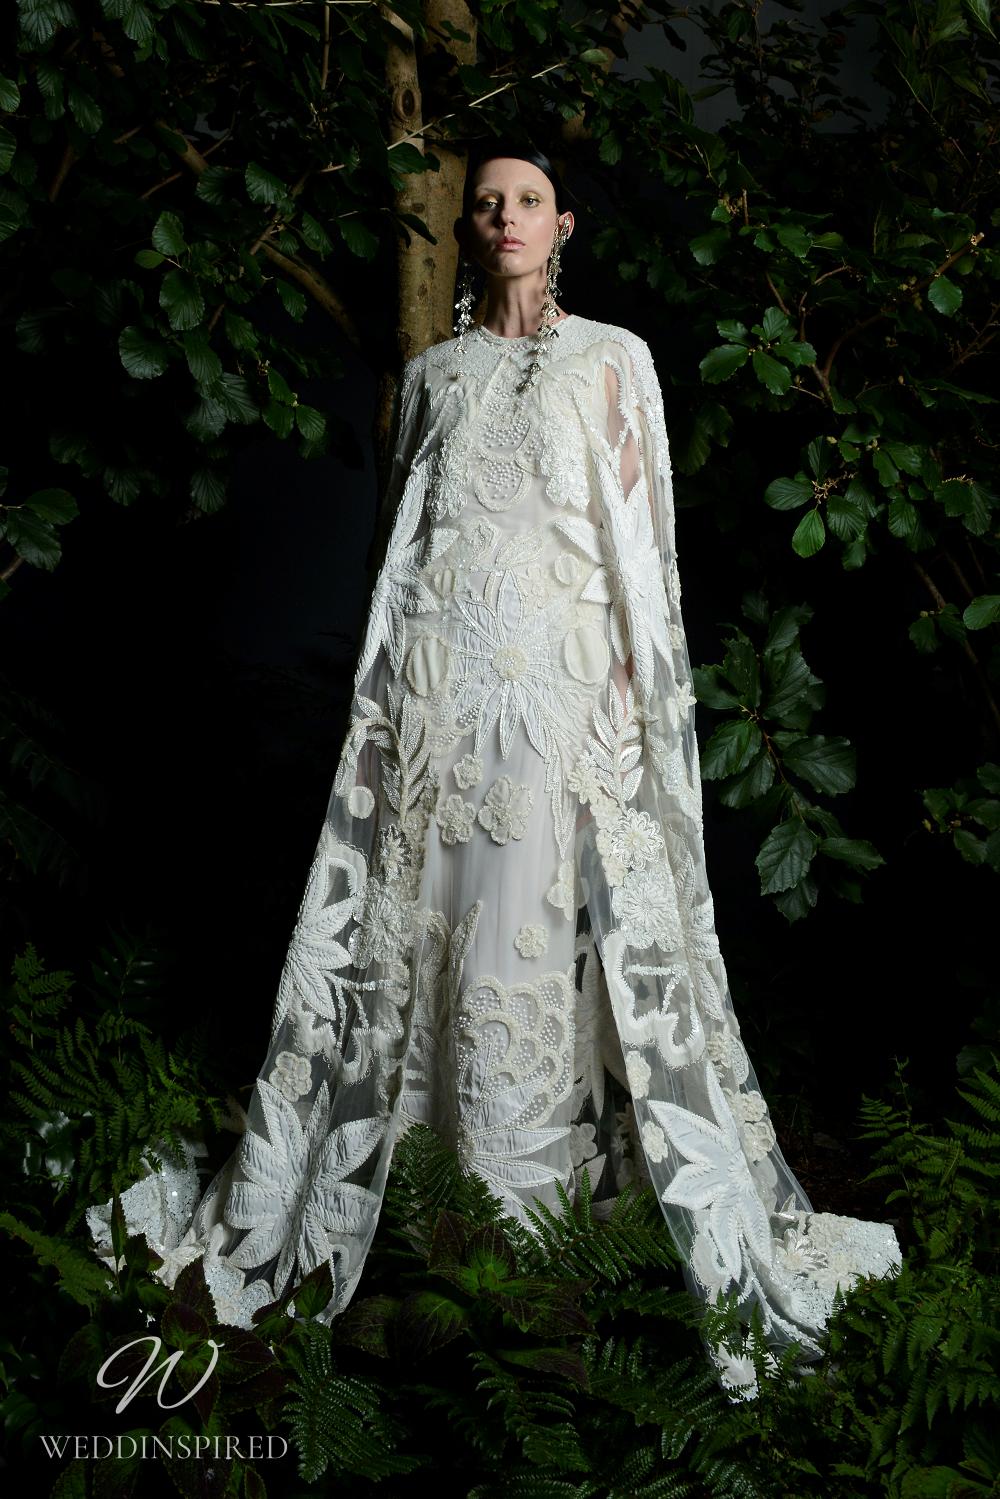 A Naeem Khan Fall 2021 sheath wedding dress with bold floral print and a cape